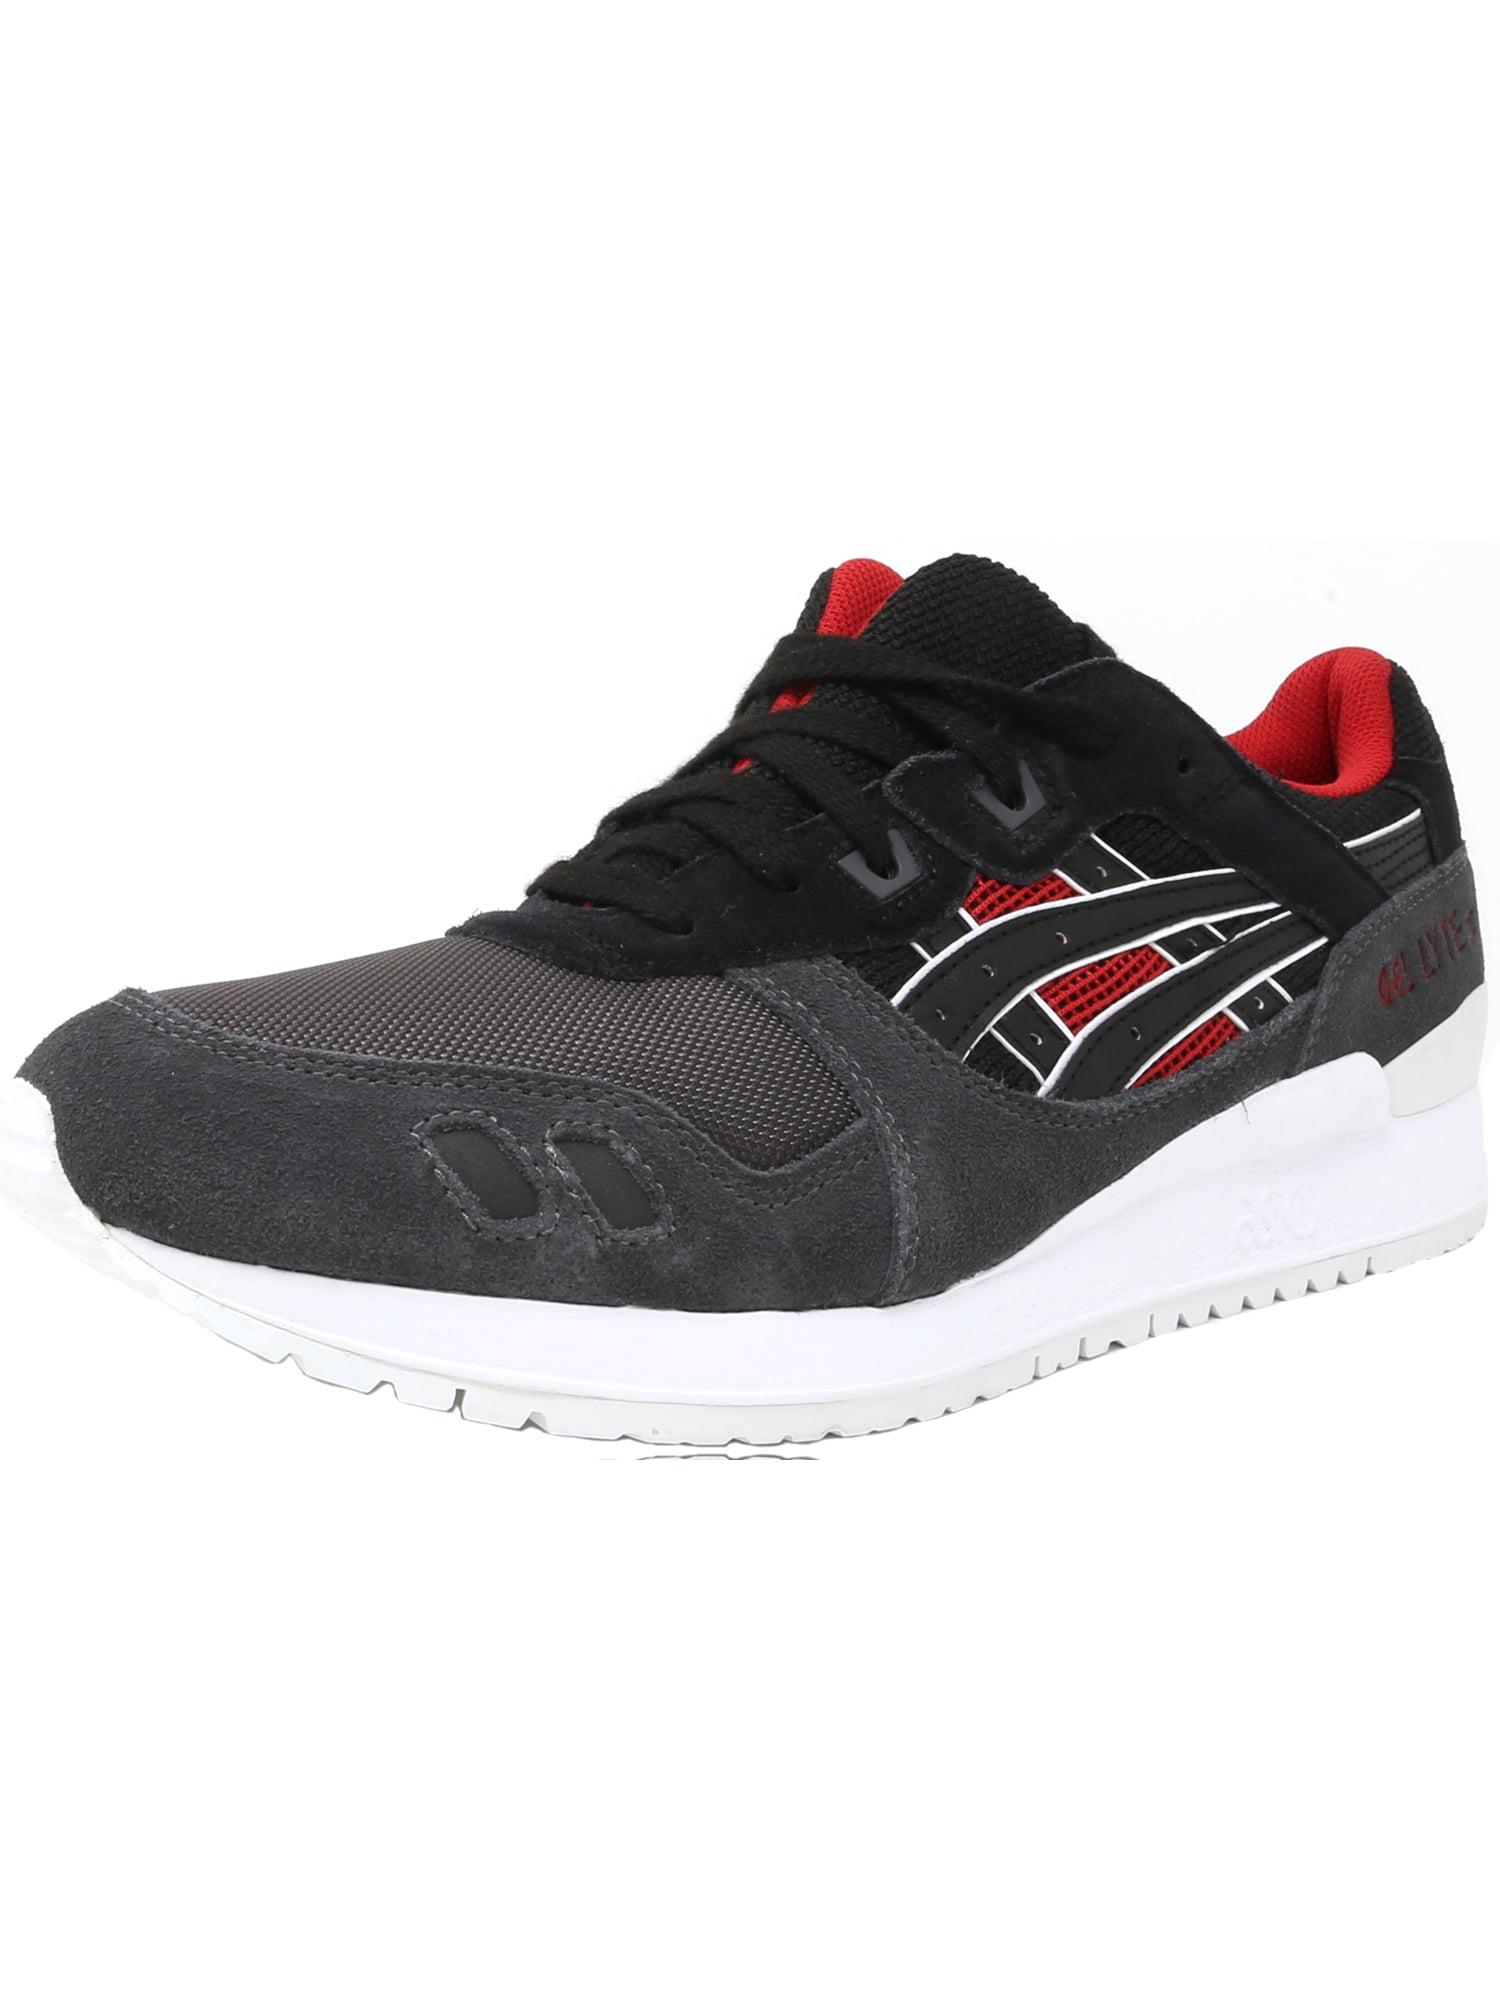 ASICS Men's Gel-Lyte Iii White / Ankle-High Leather Running Shoe - 9.5M